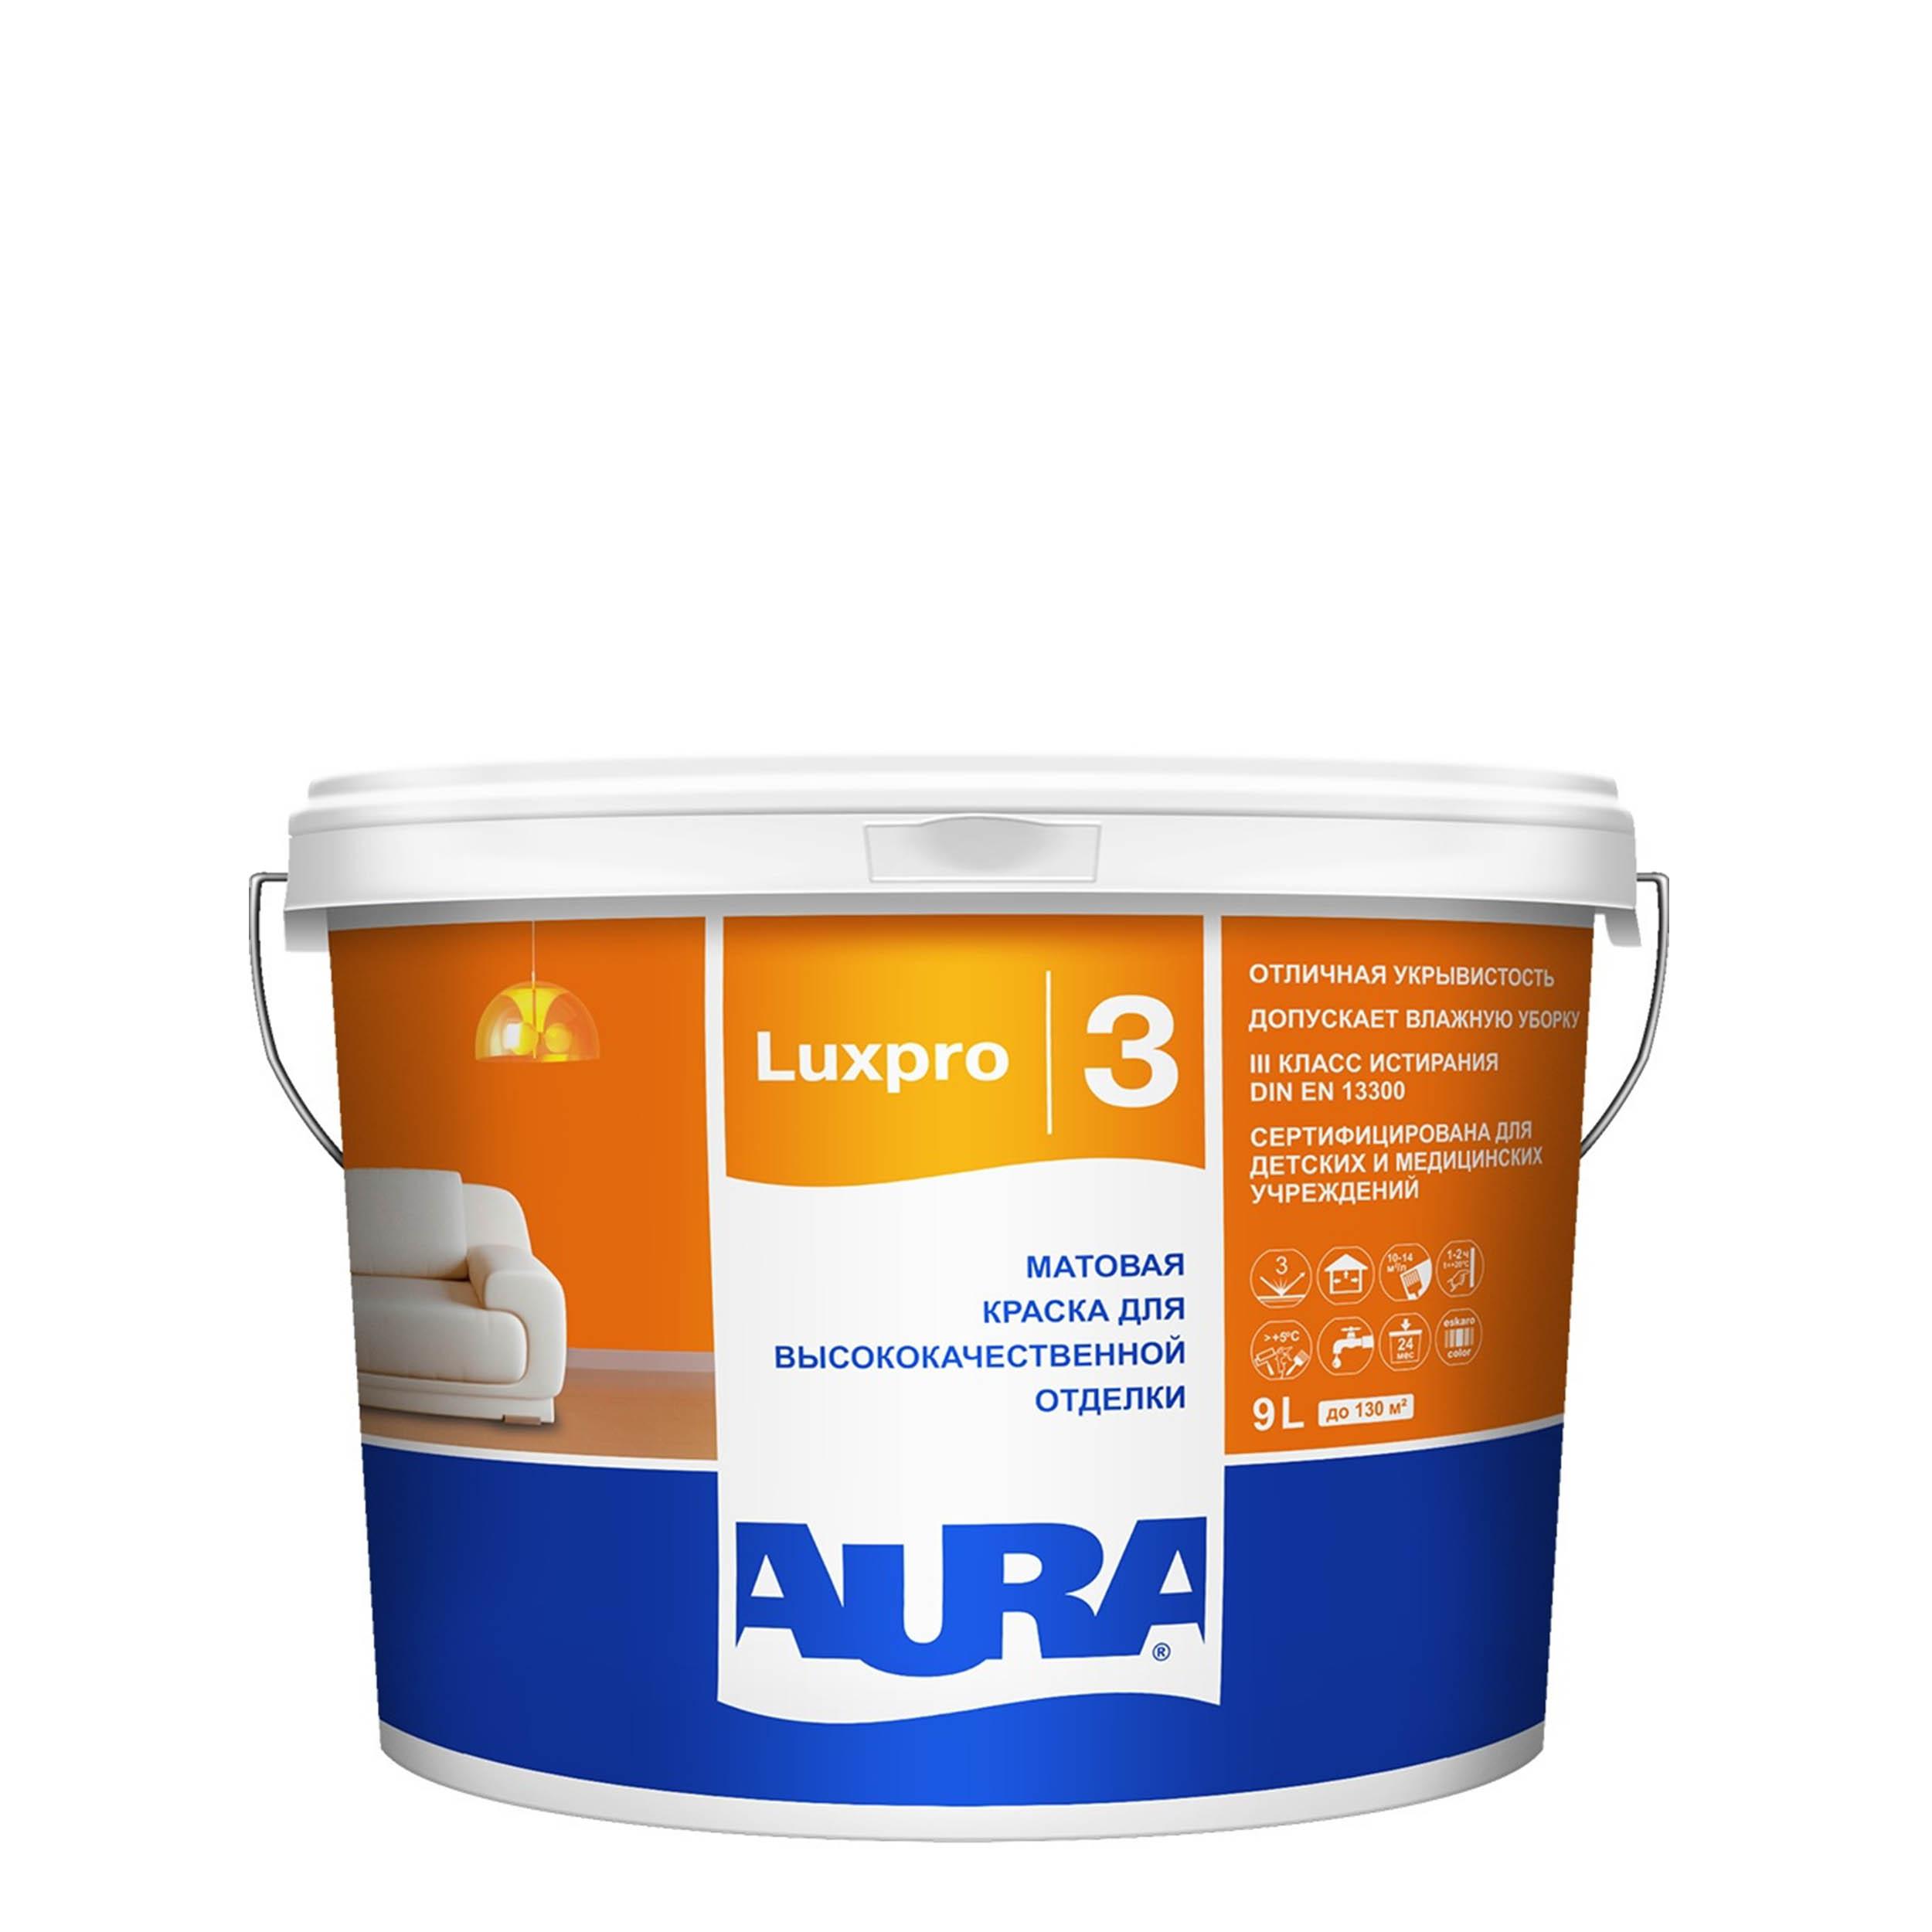 Фото 4 - Краска интерьерная, Aura LuxPRO 3, RAL 5007, 11 кг.